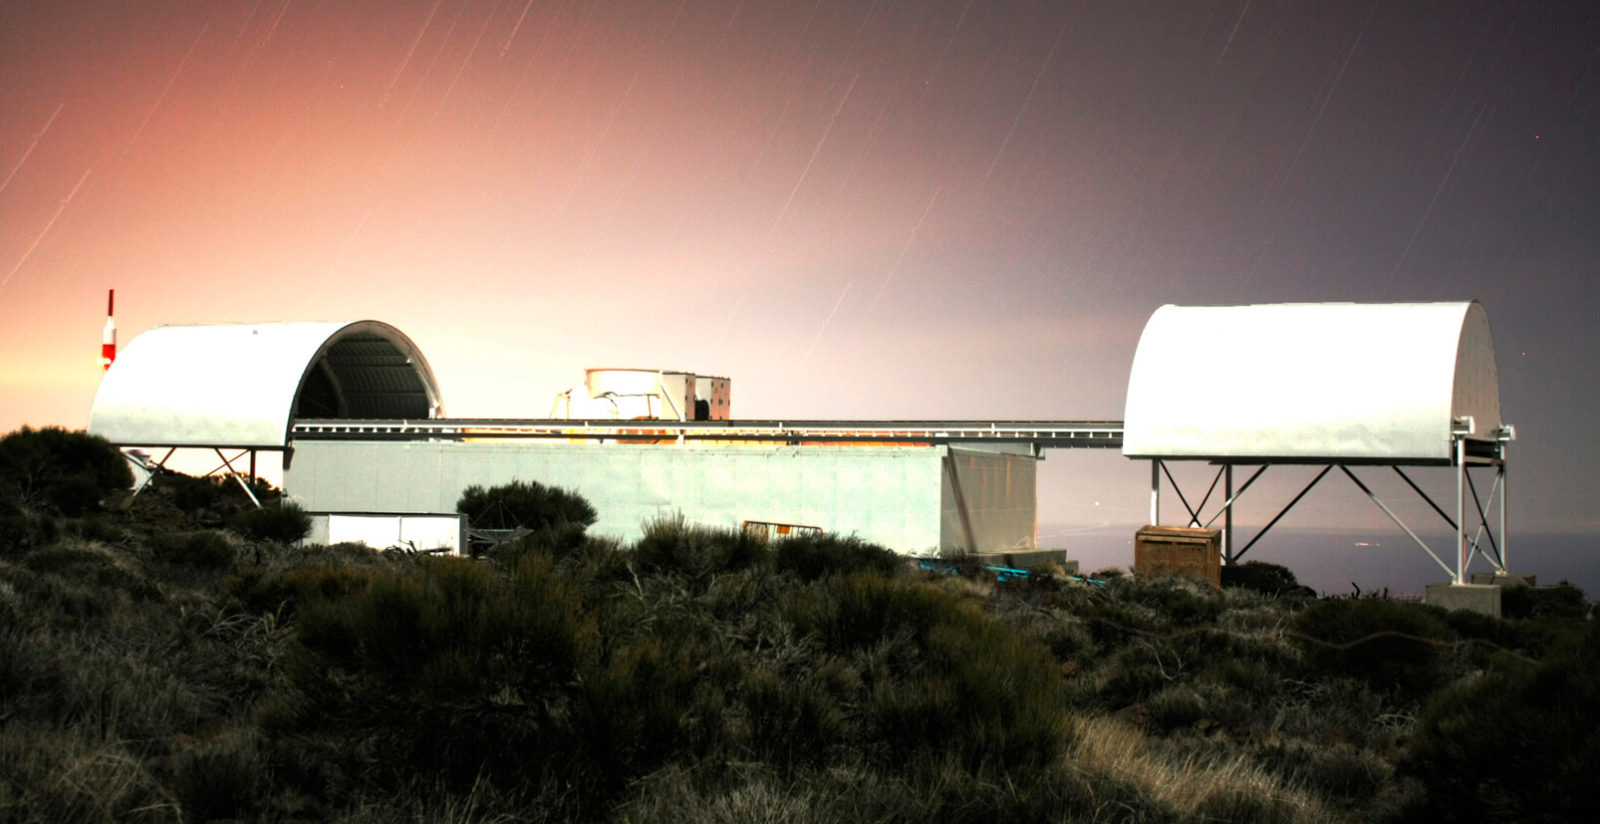 Telescope_Enclosures_Singular_Projects_USA_Chile_Spain_IDOM_ADA_3_